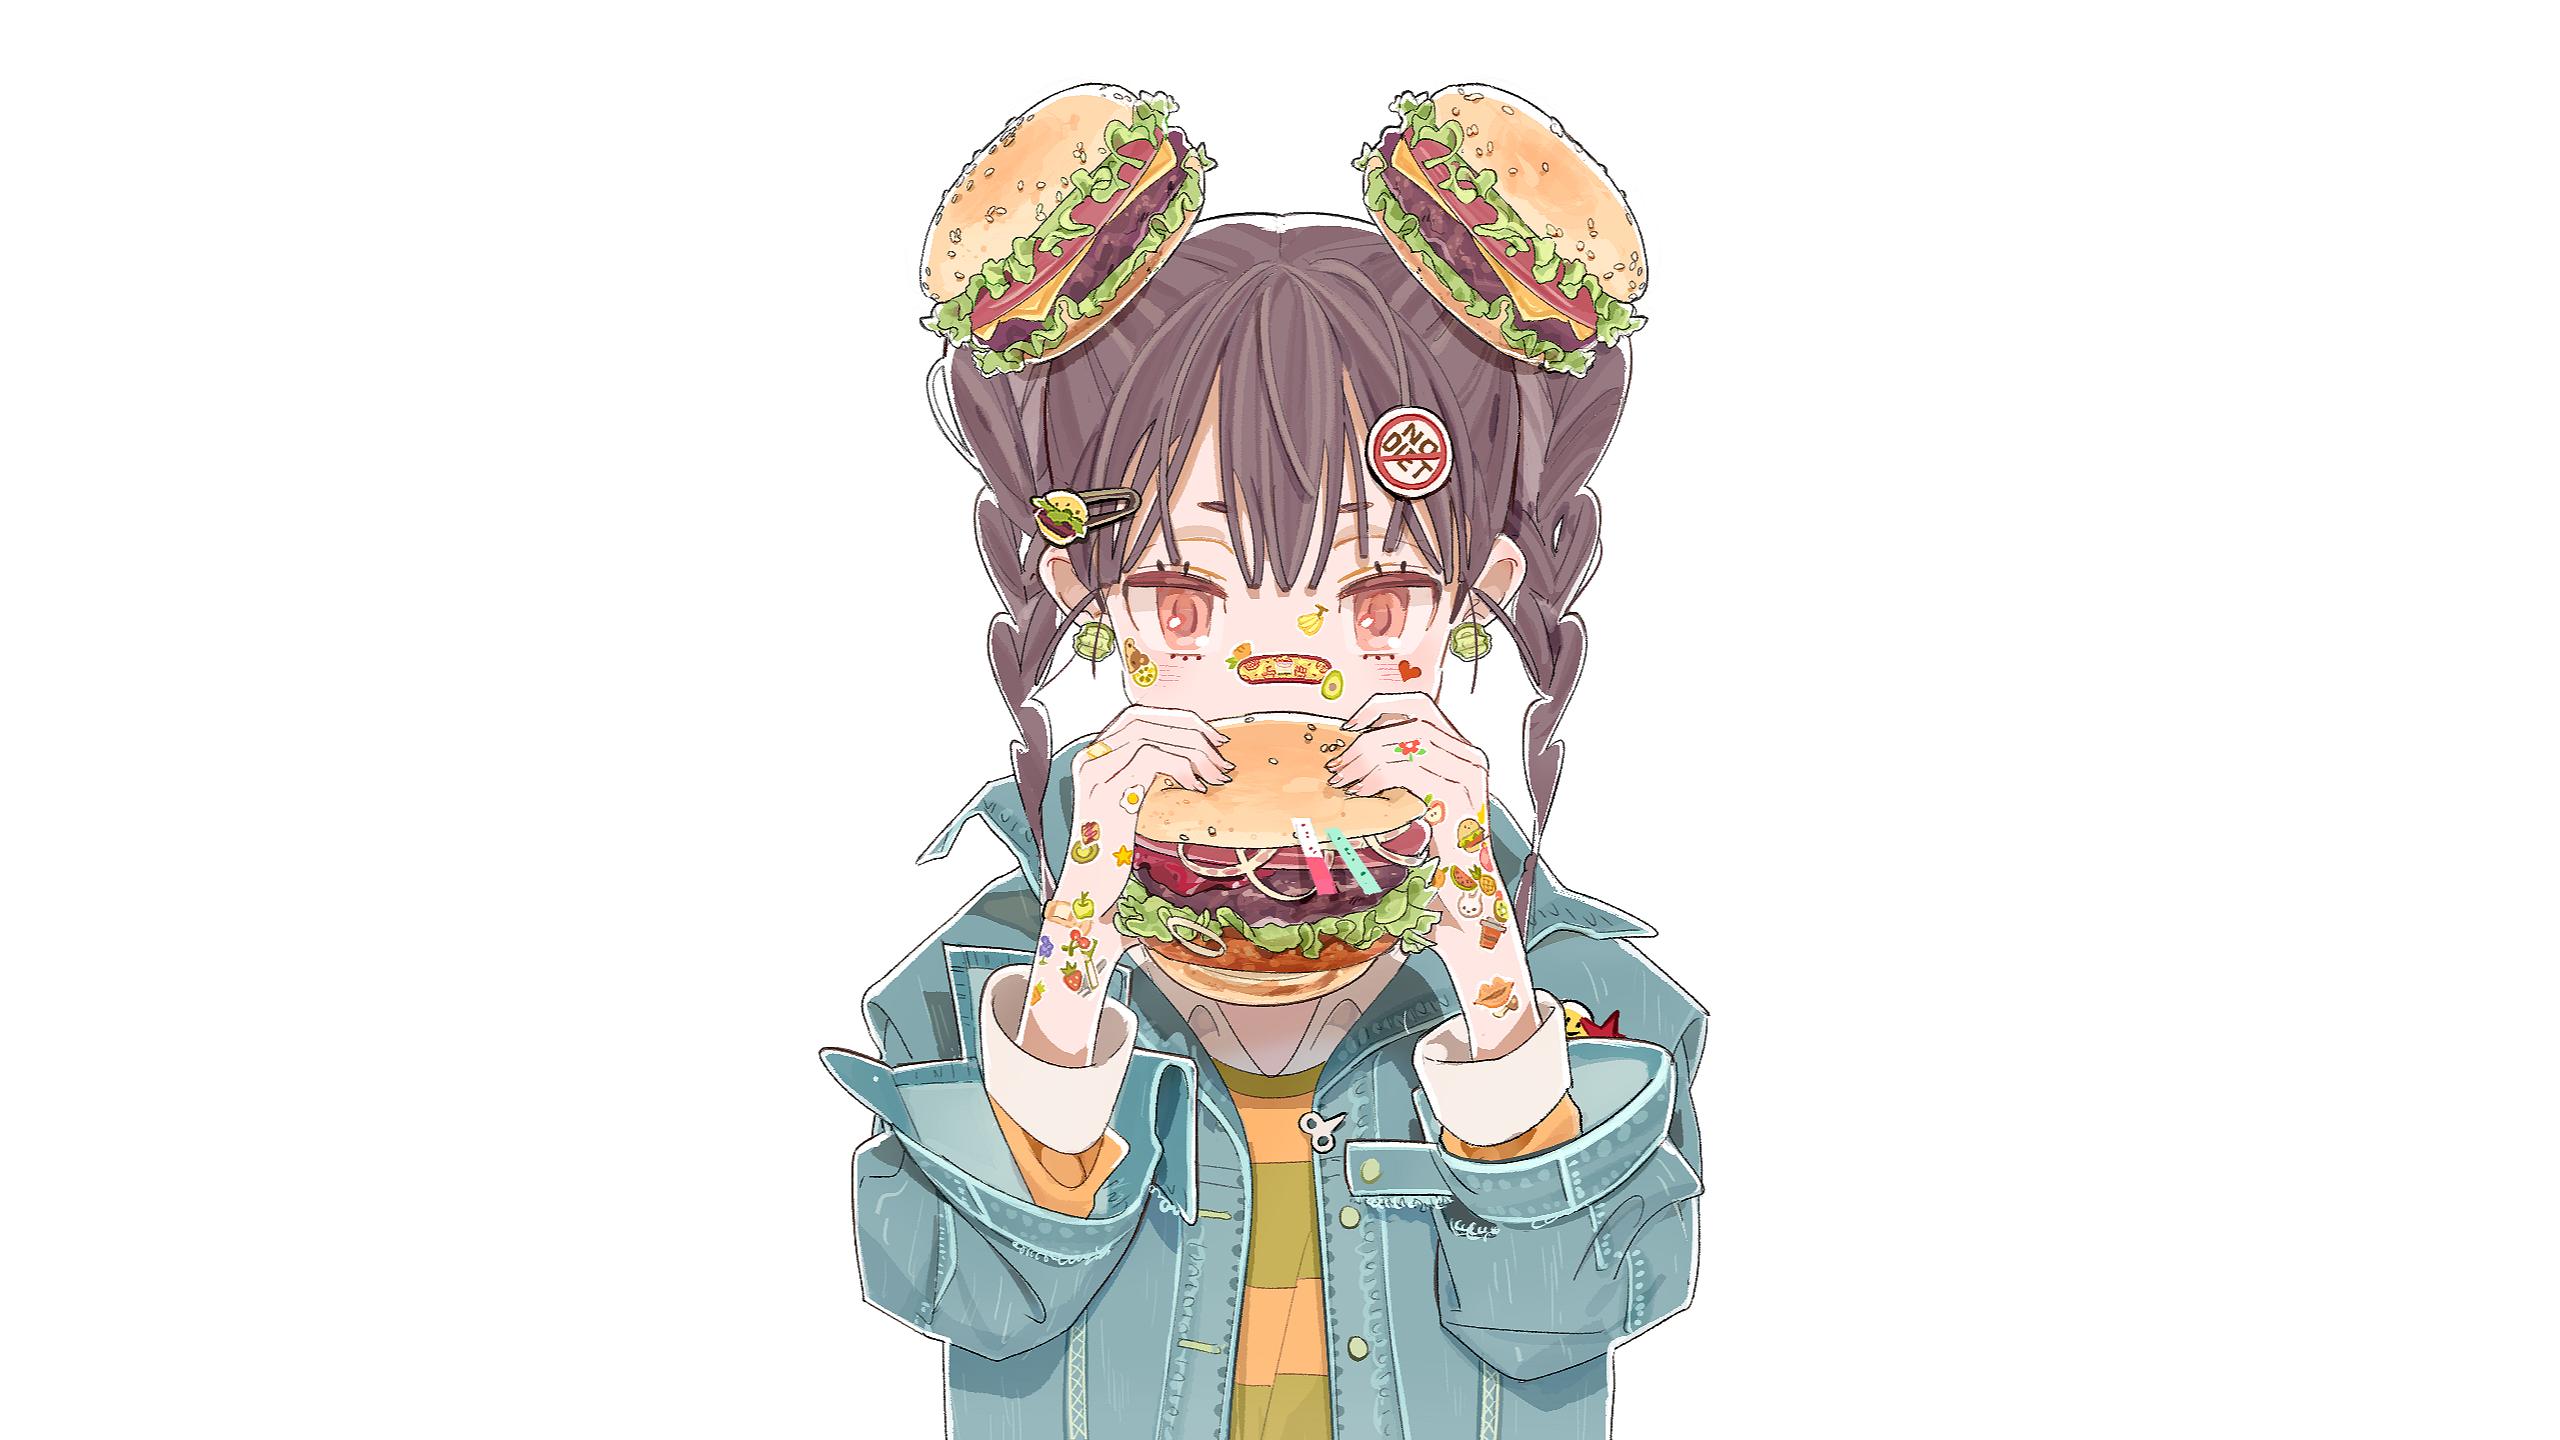 Anime 2560x1440 anime anime girls white background original characters anime girls eating hamburgers red eyes